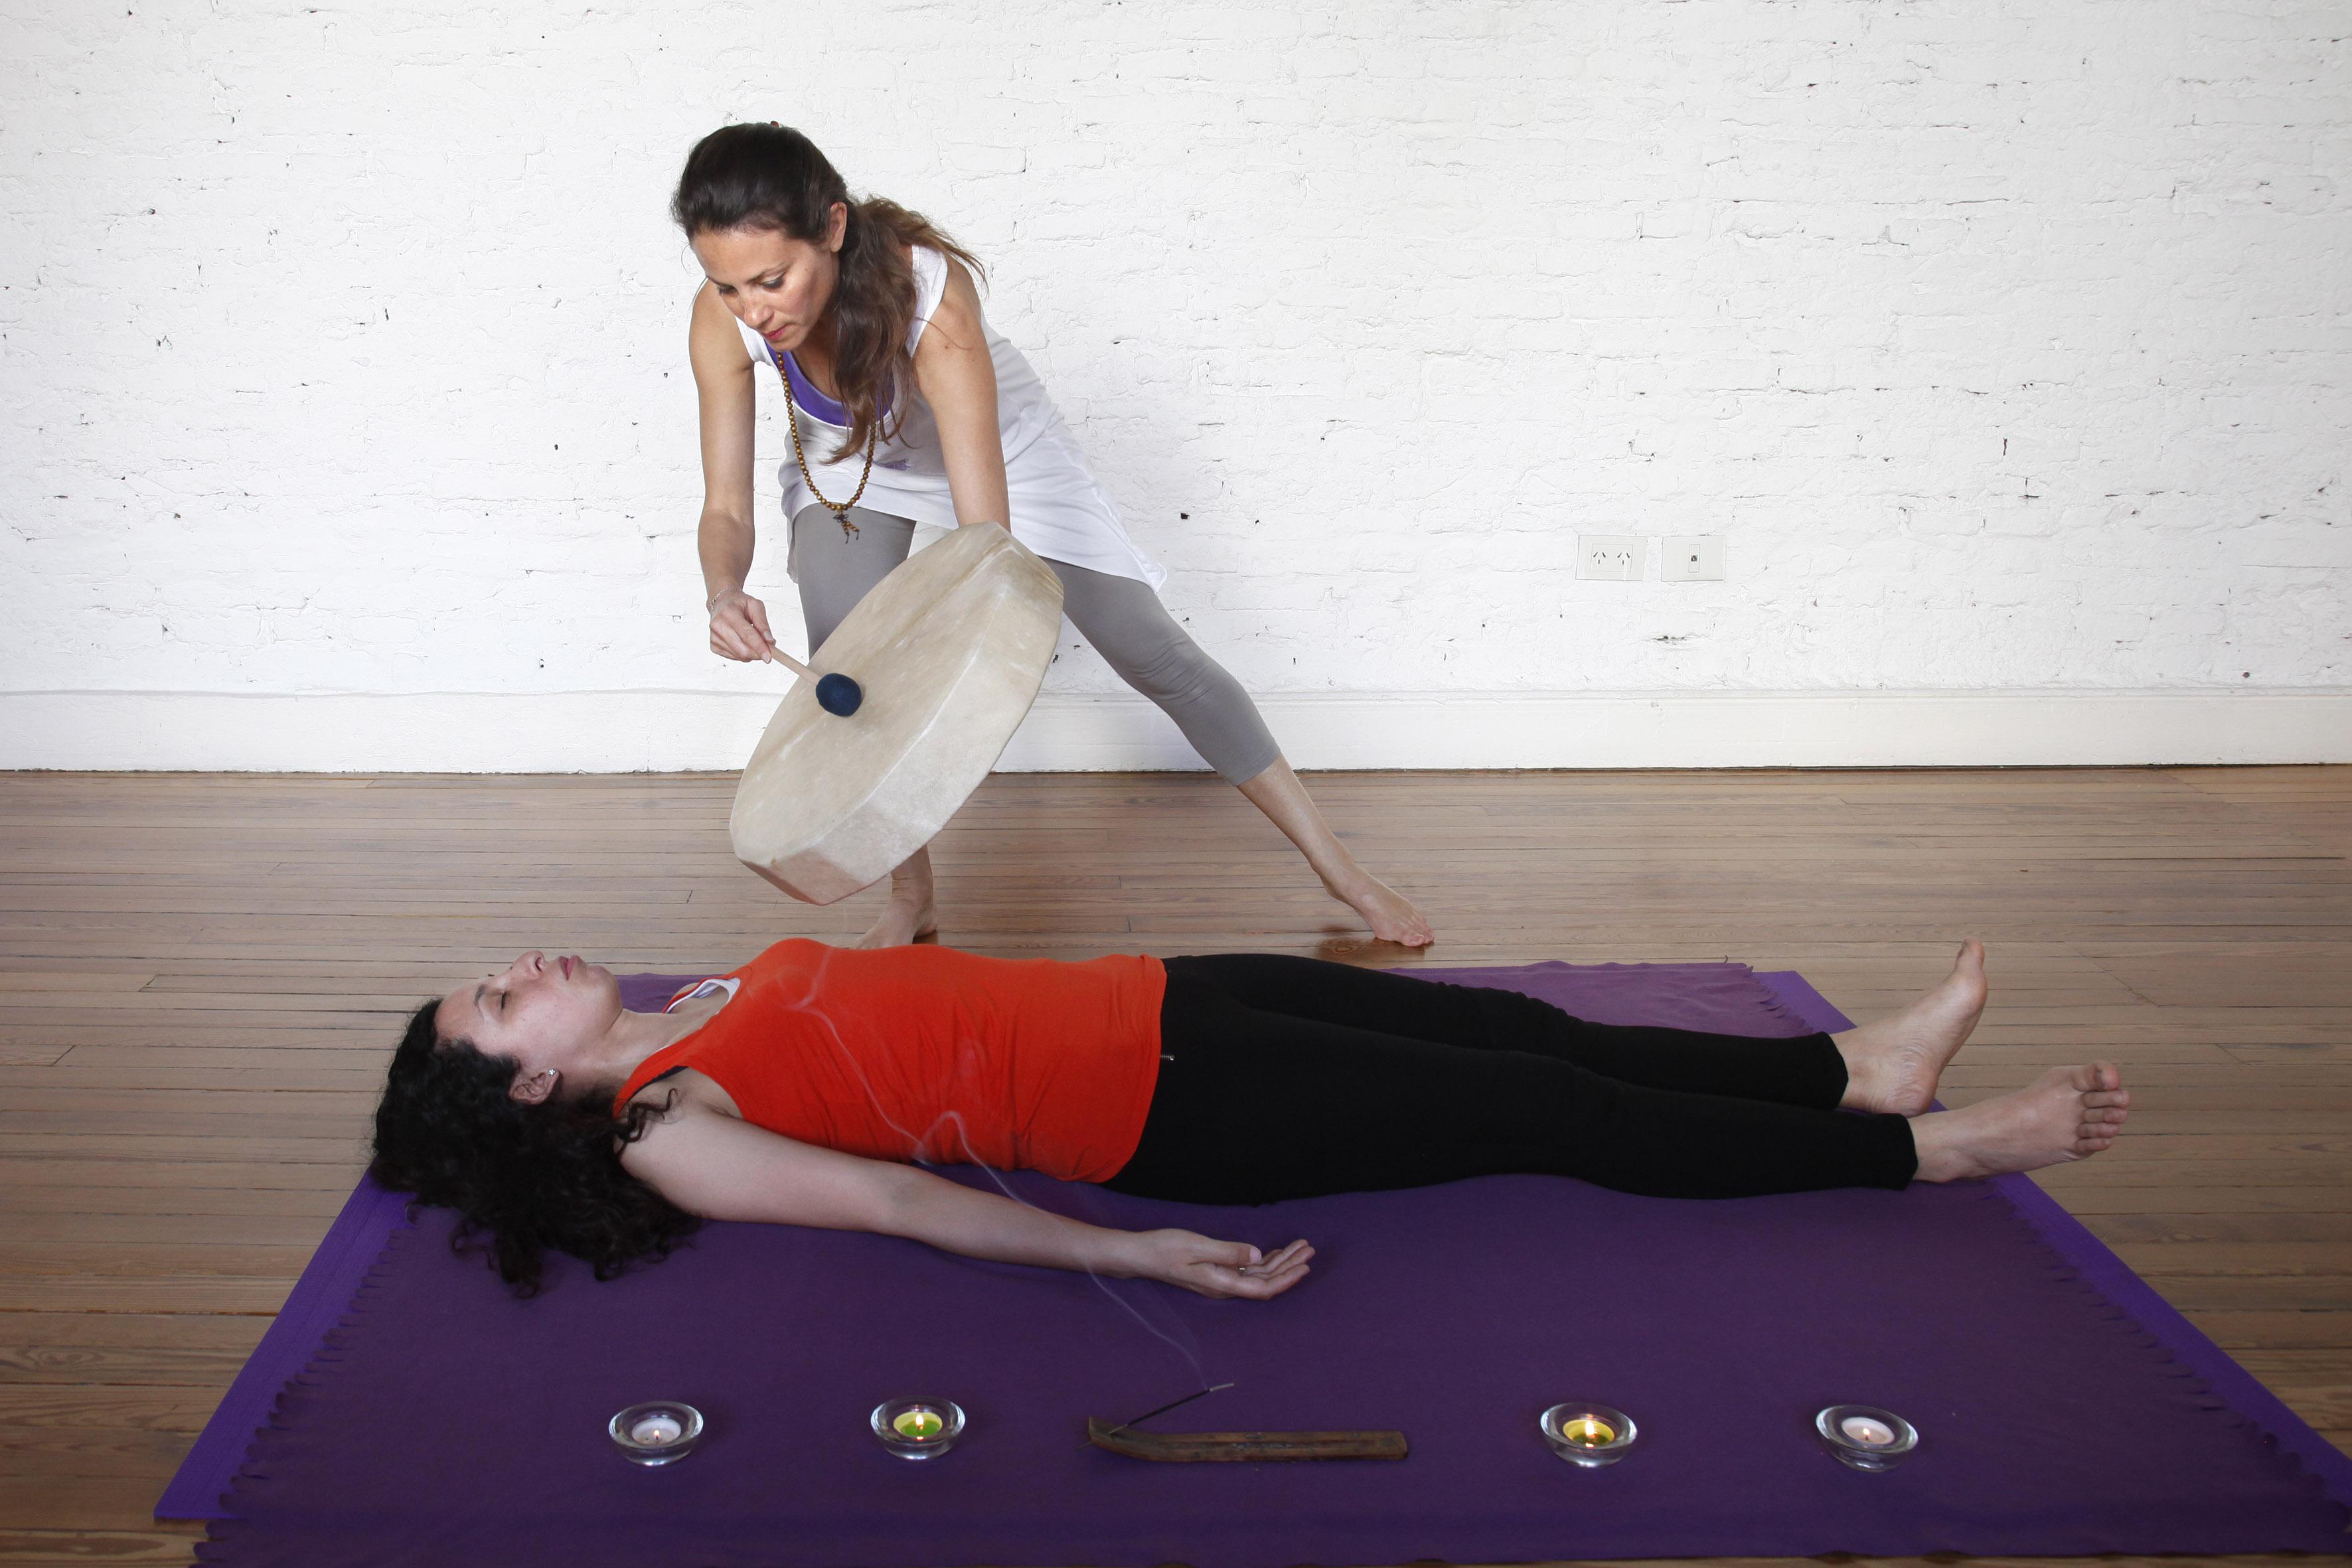 Terapia sonora-masajes sonoros